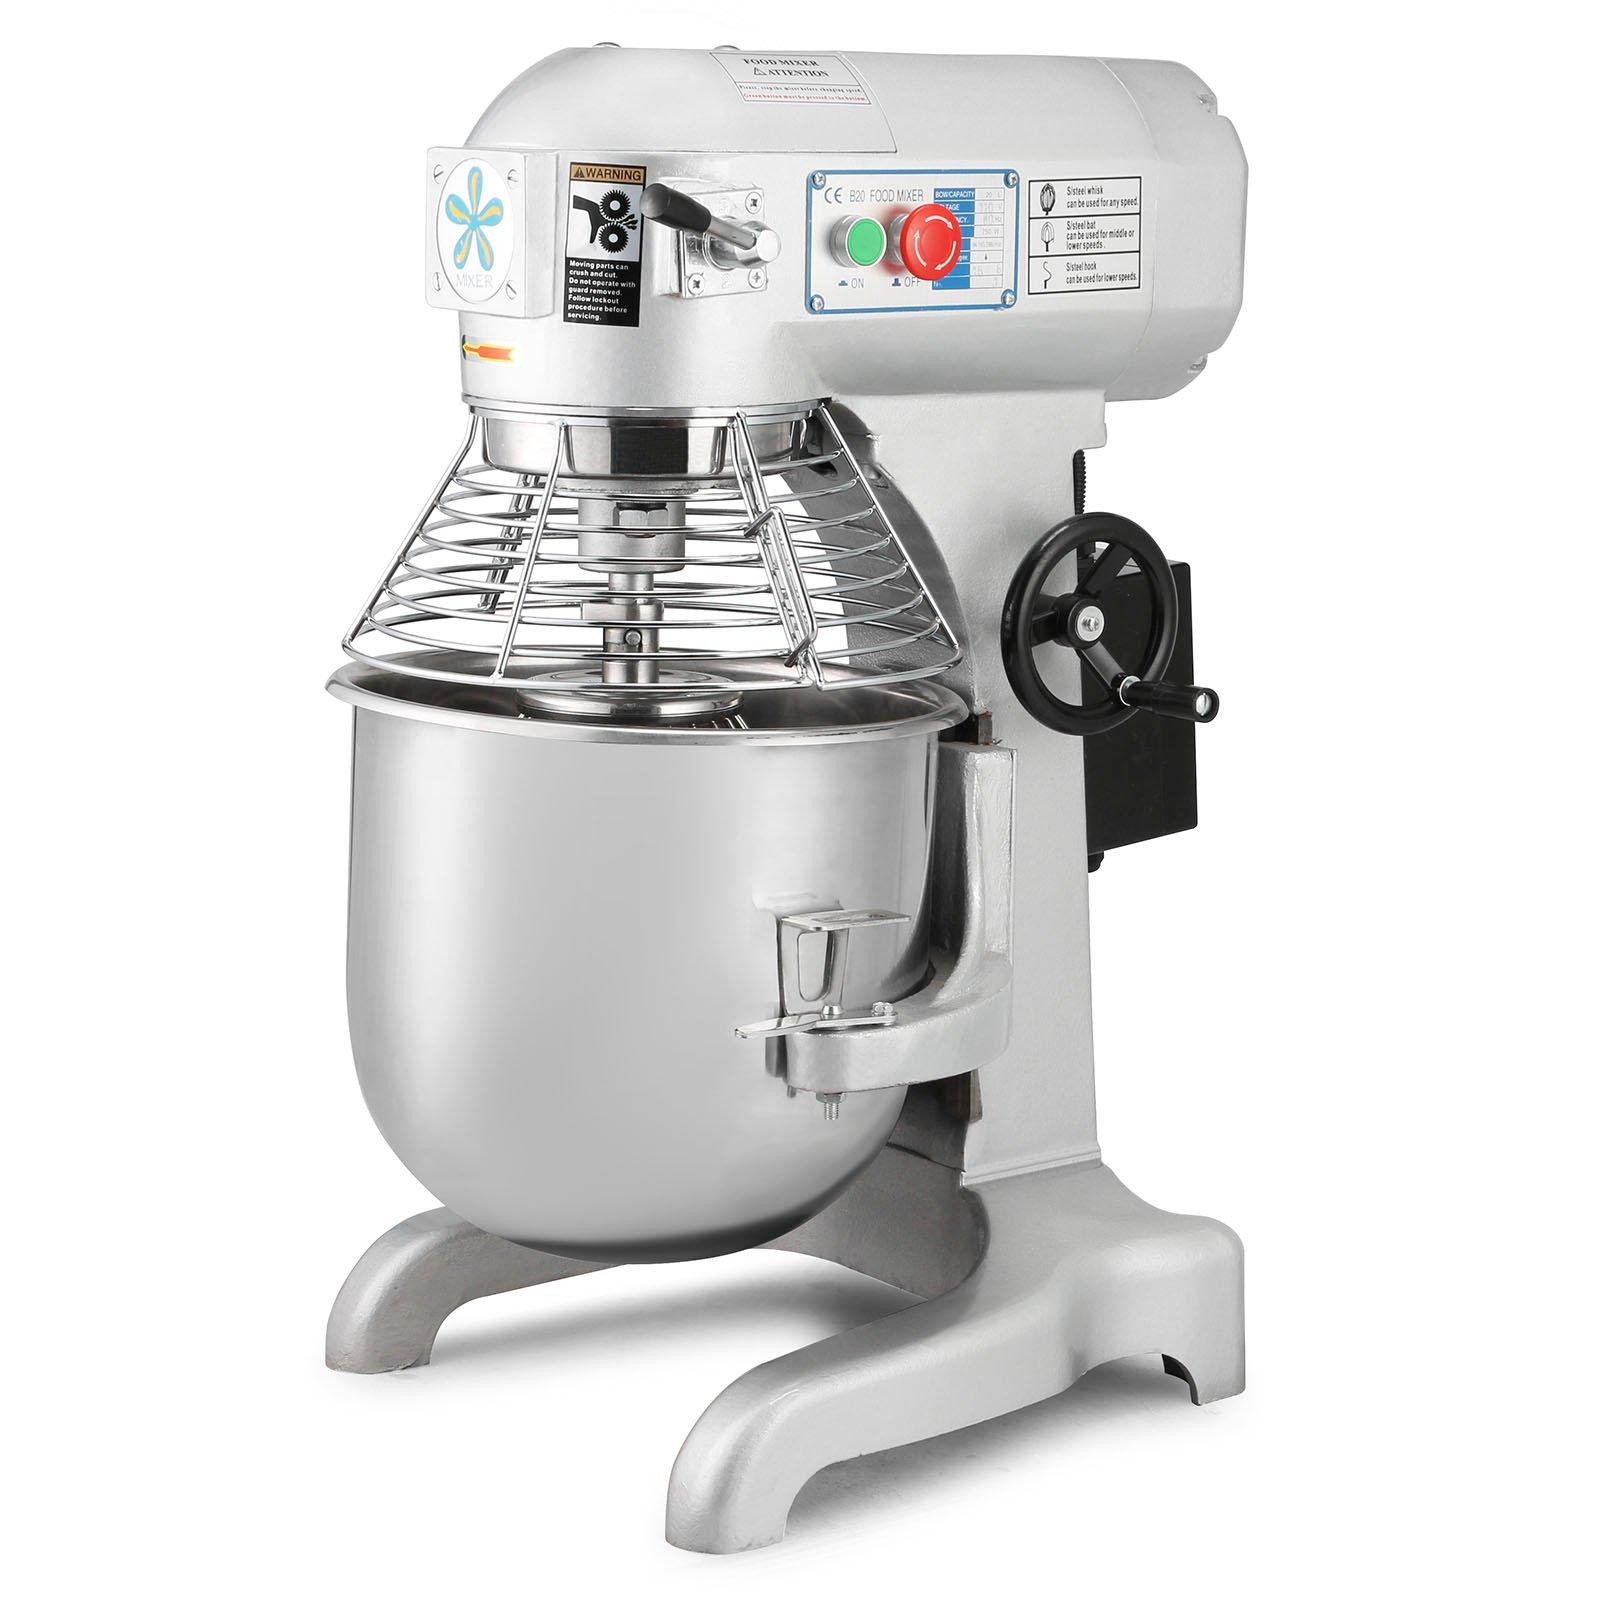 Happybuy Commercial Food Mixer 750W Dough Mixer Maker 3 Speeds Adjustable Commercial Mixer Grinder 94/165/386 RPM Stand Mixer (20 qt) by Happybuy (Image #1)